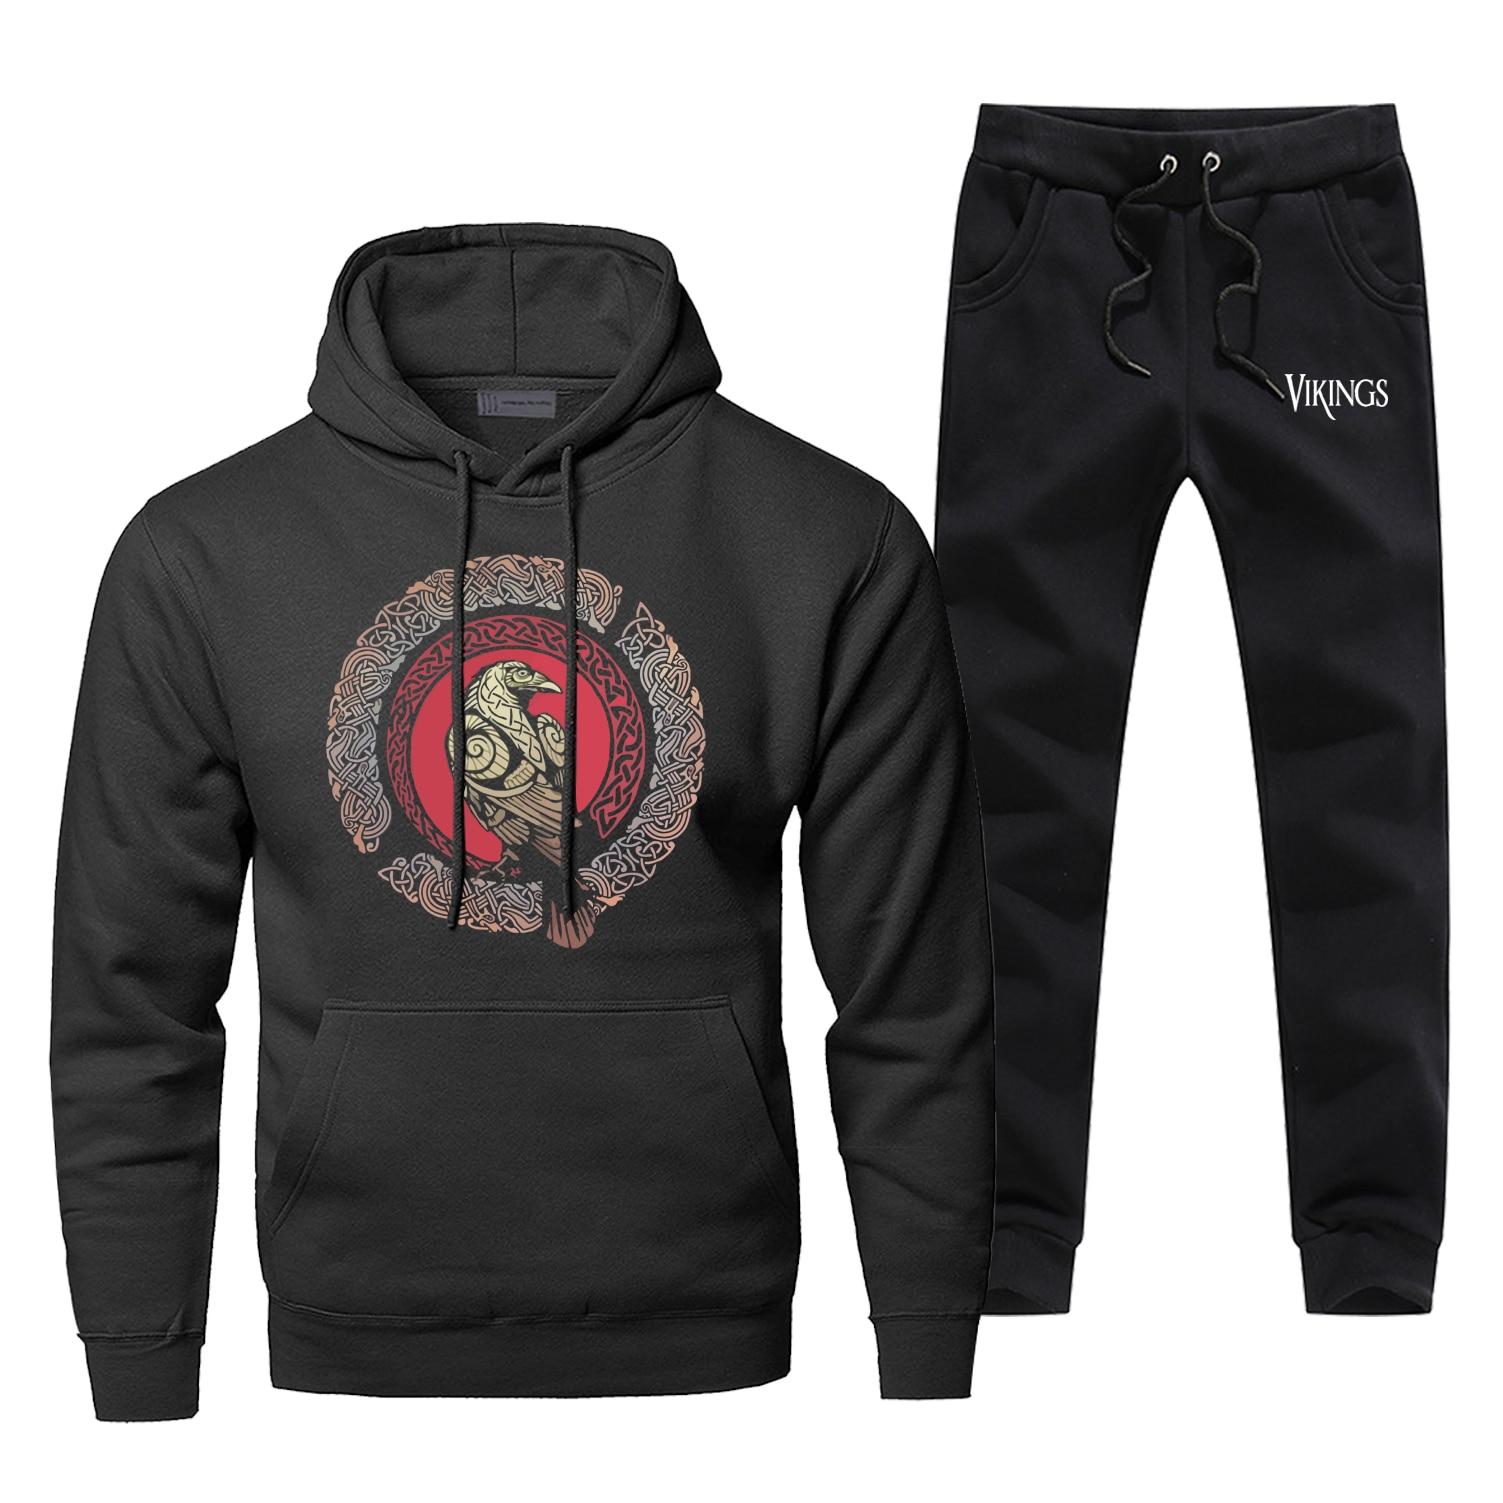 Odin Vikings Hoodie Pants Set Men Sweatshirt Male Hoodies Sweatshirts Mens Sets Two Piece Pant Scandinavian Runes Valhalla Coat